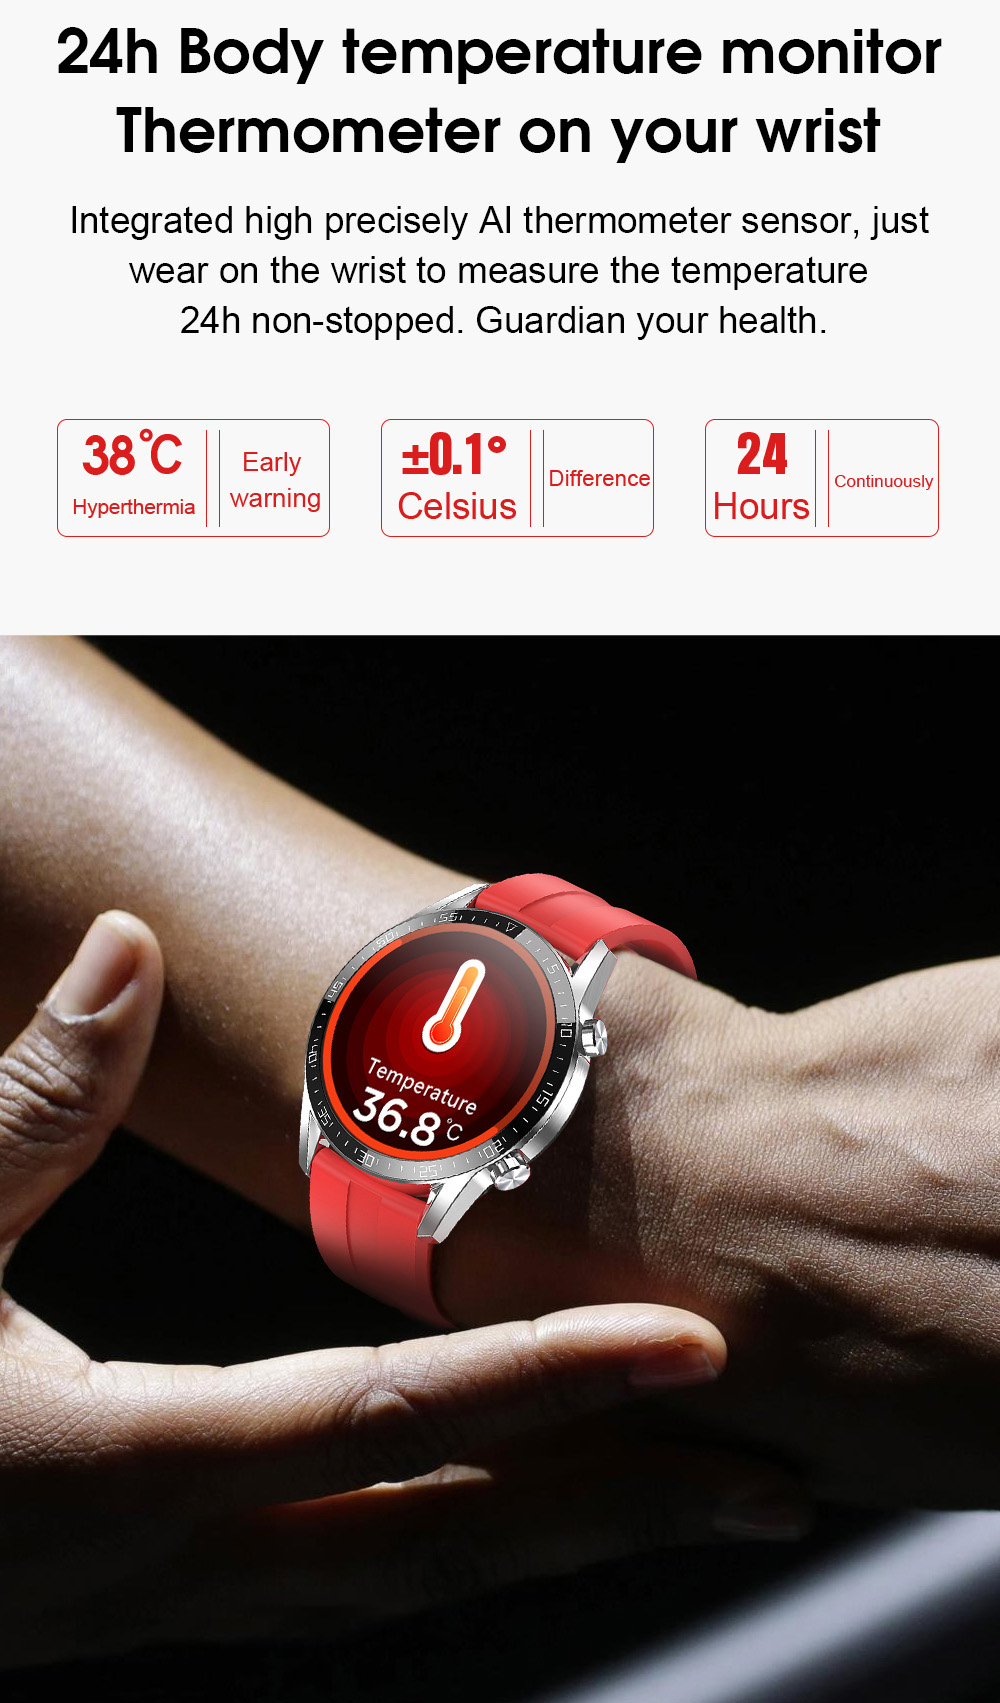 Ha8b1abe80c7e43fbab4a84a2b2dd21080 IPbzhe Smart Watch Men Thermometer ECG Smart Watch IP68 Waterproof Blood Pressure Smartwatch Reloj Inteligente For Huawei Xiaomi